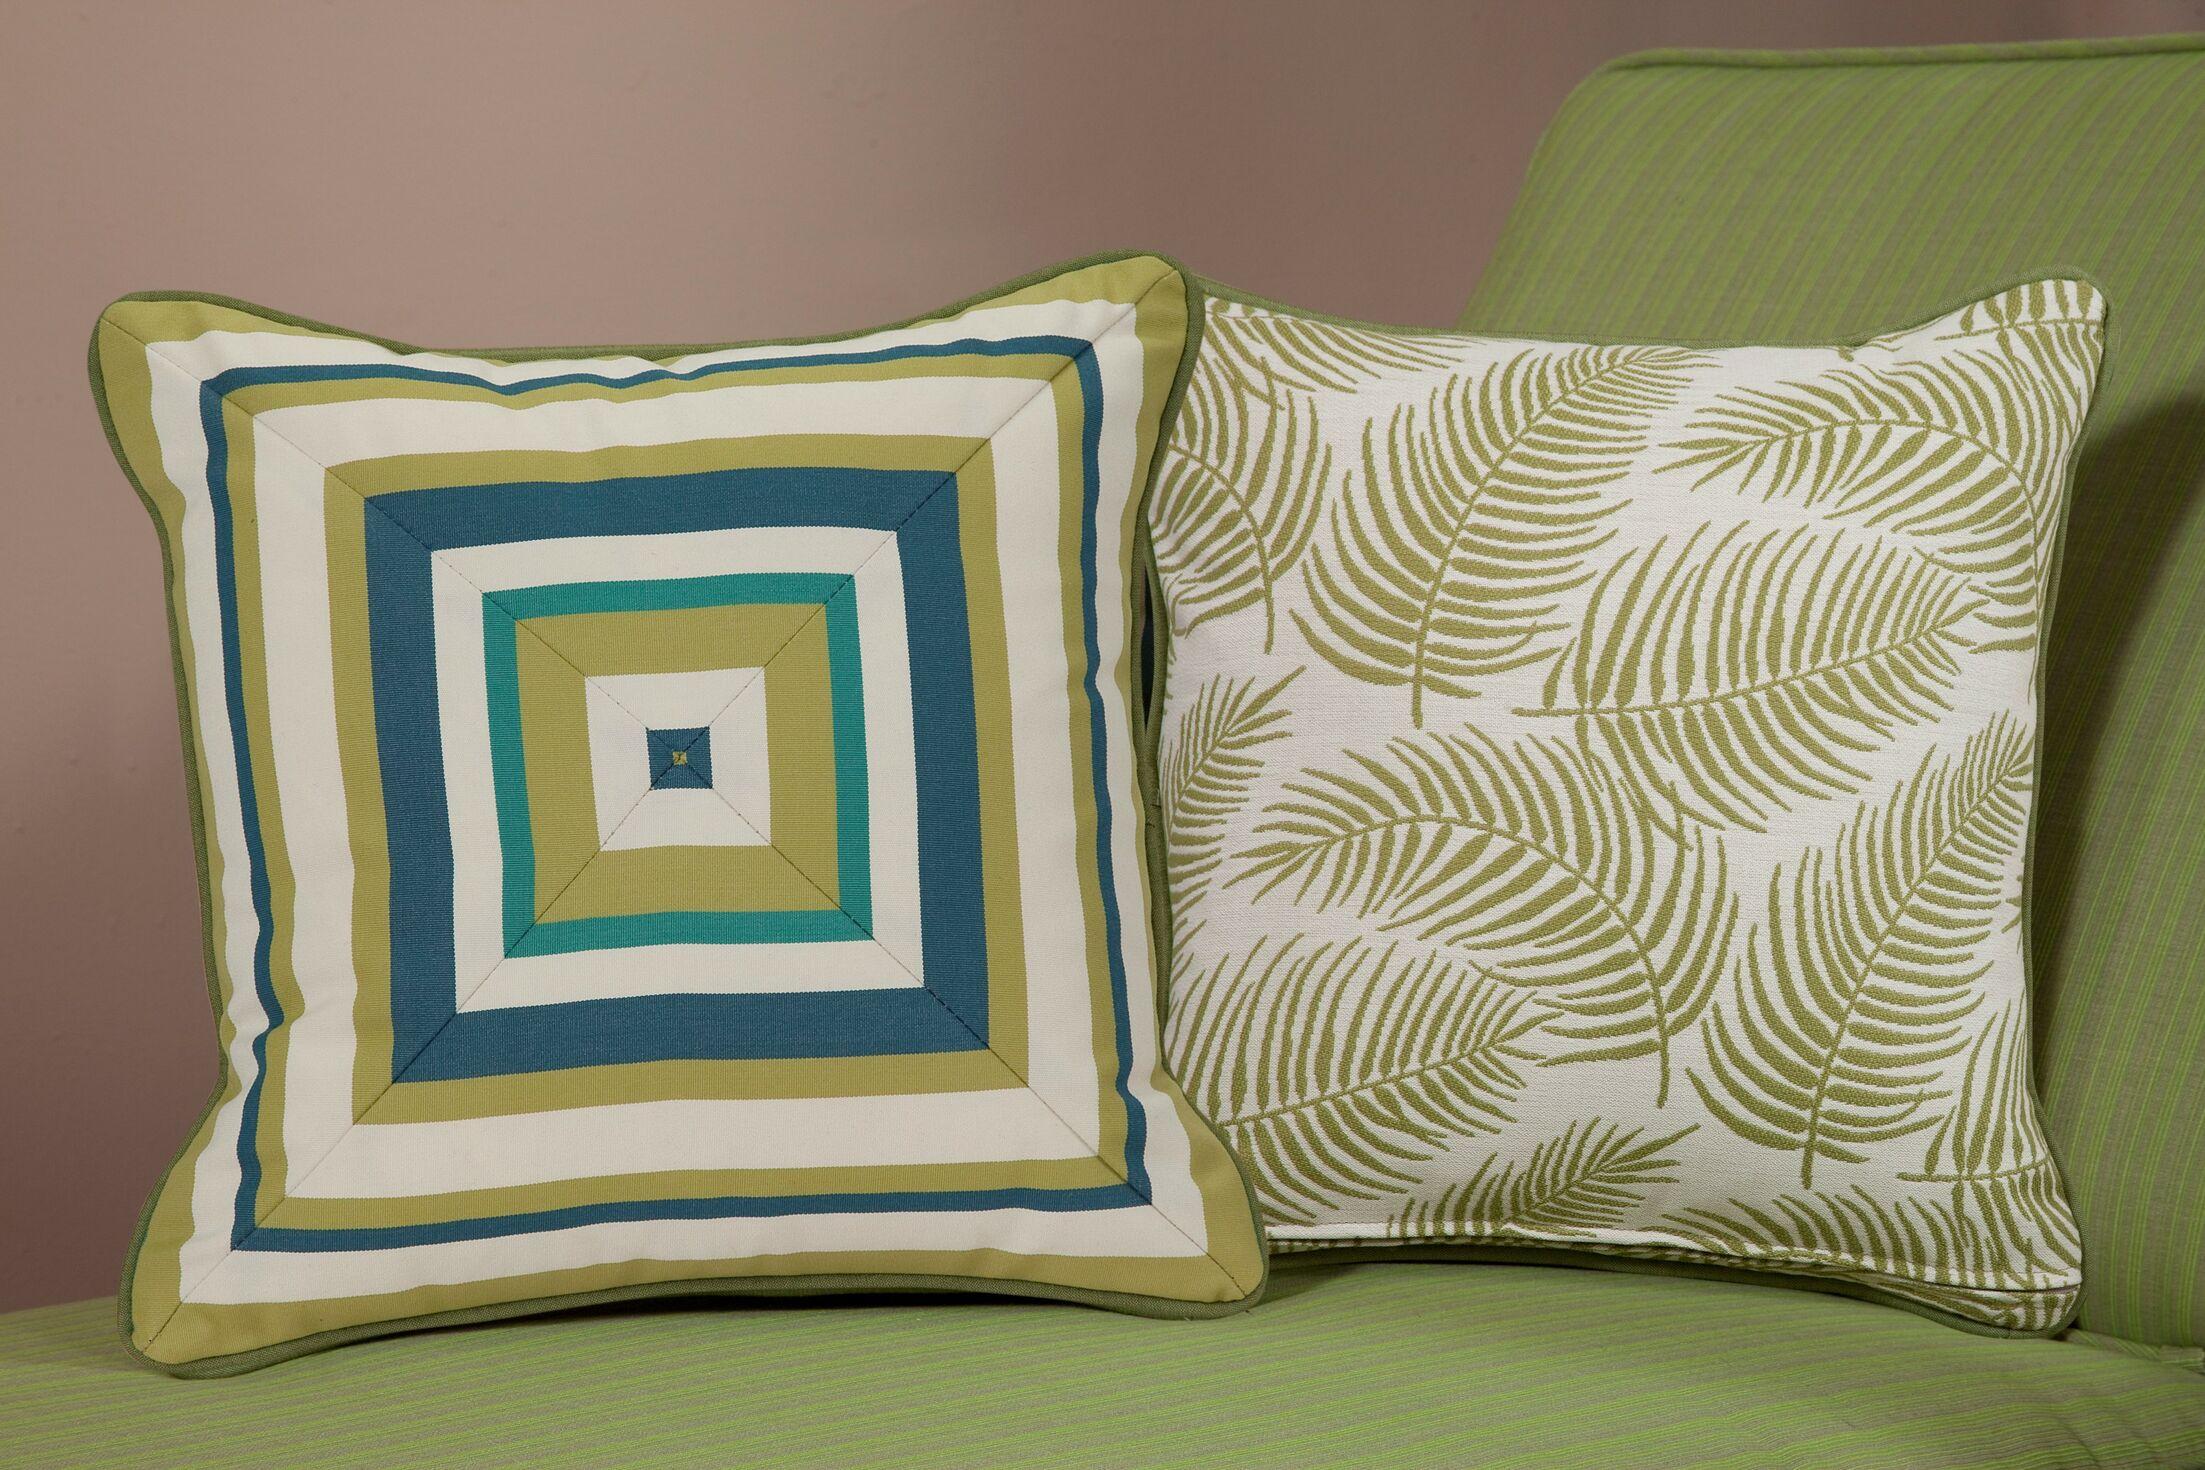 Spaeth Medium Indoor/Outdoor Sunbrella Throw Pillow